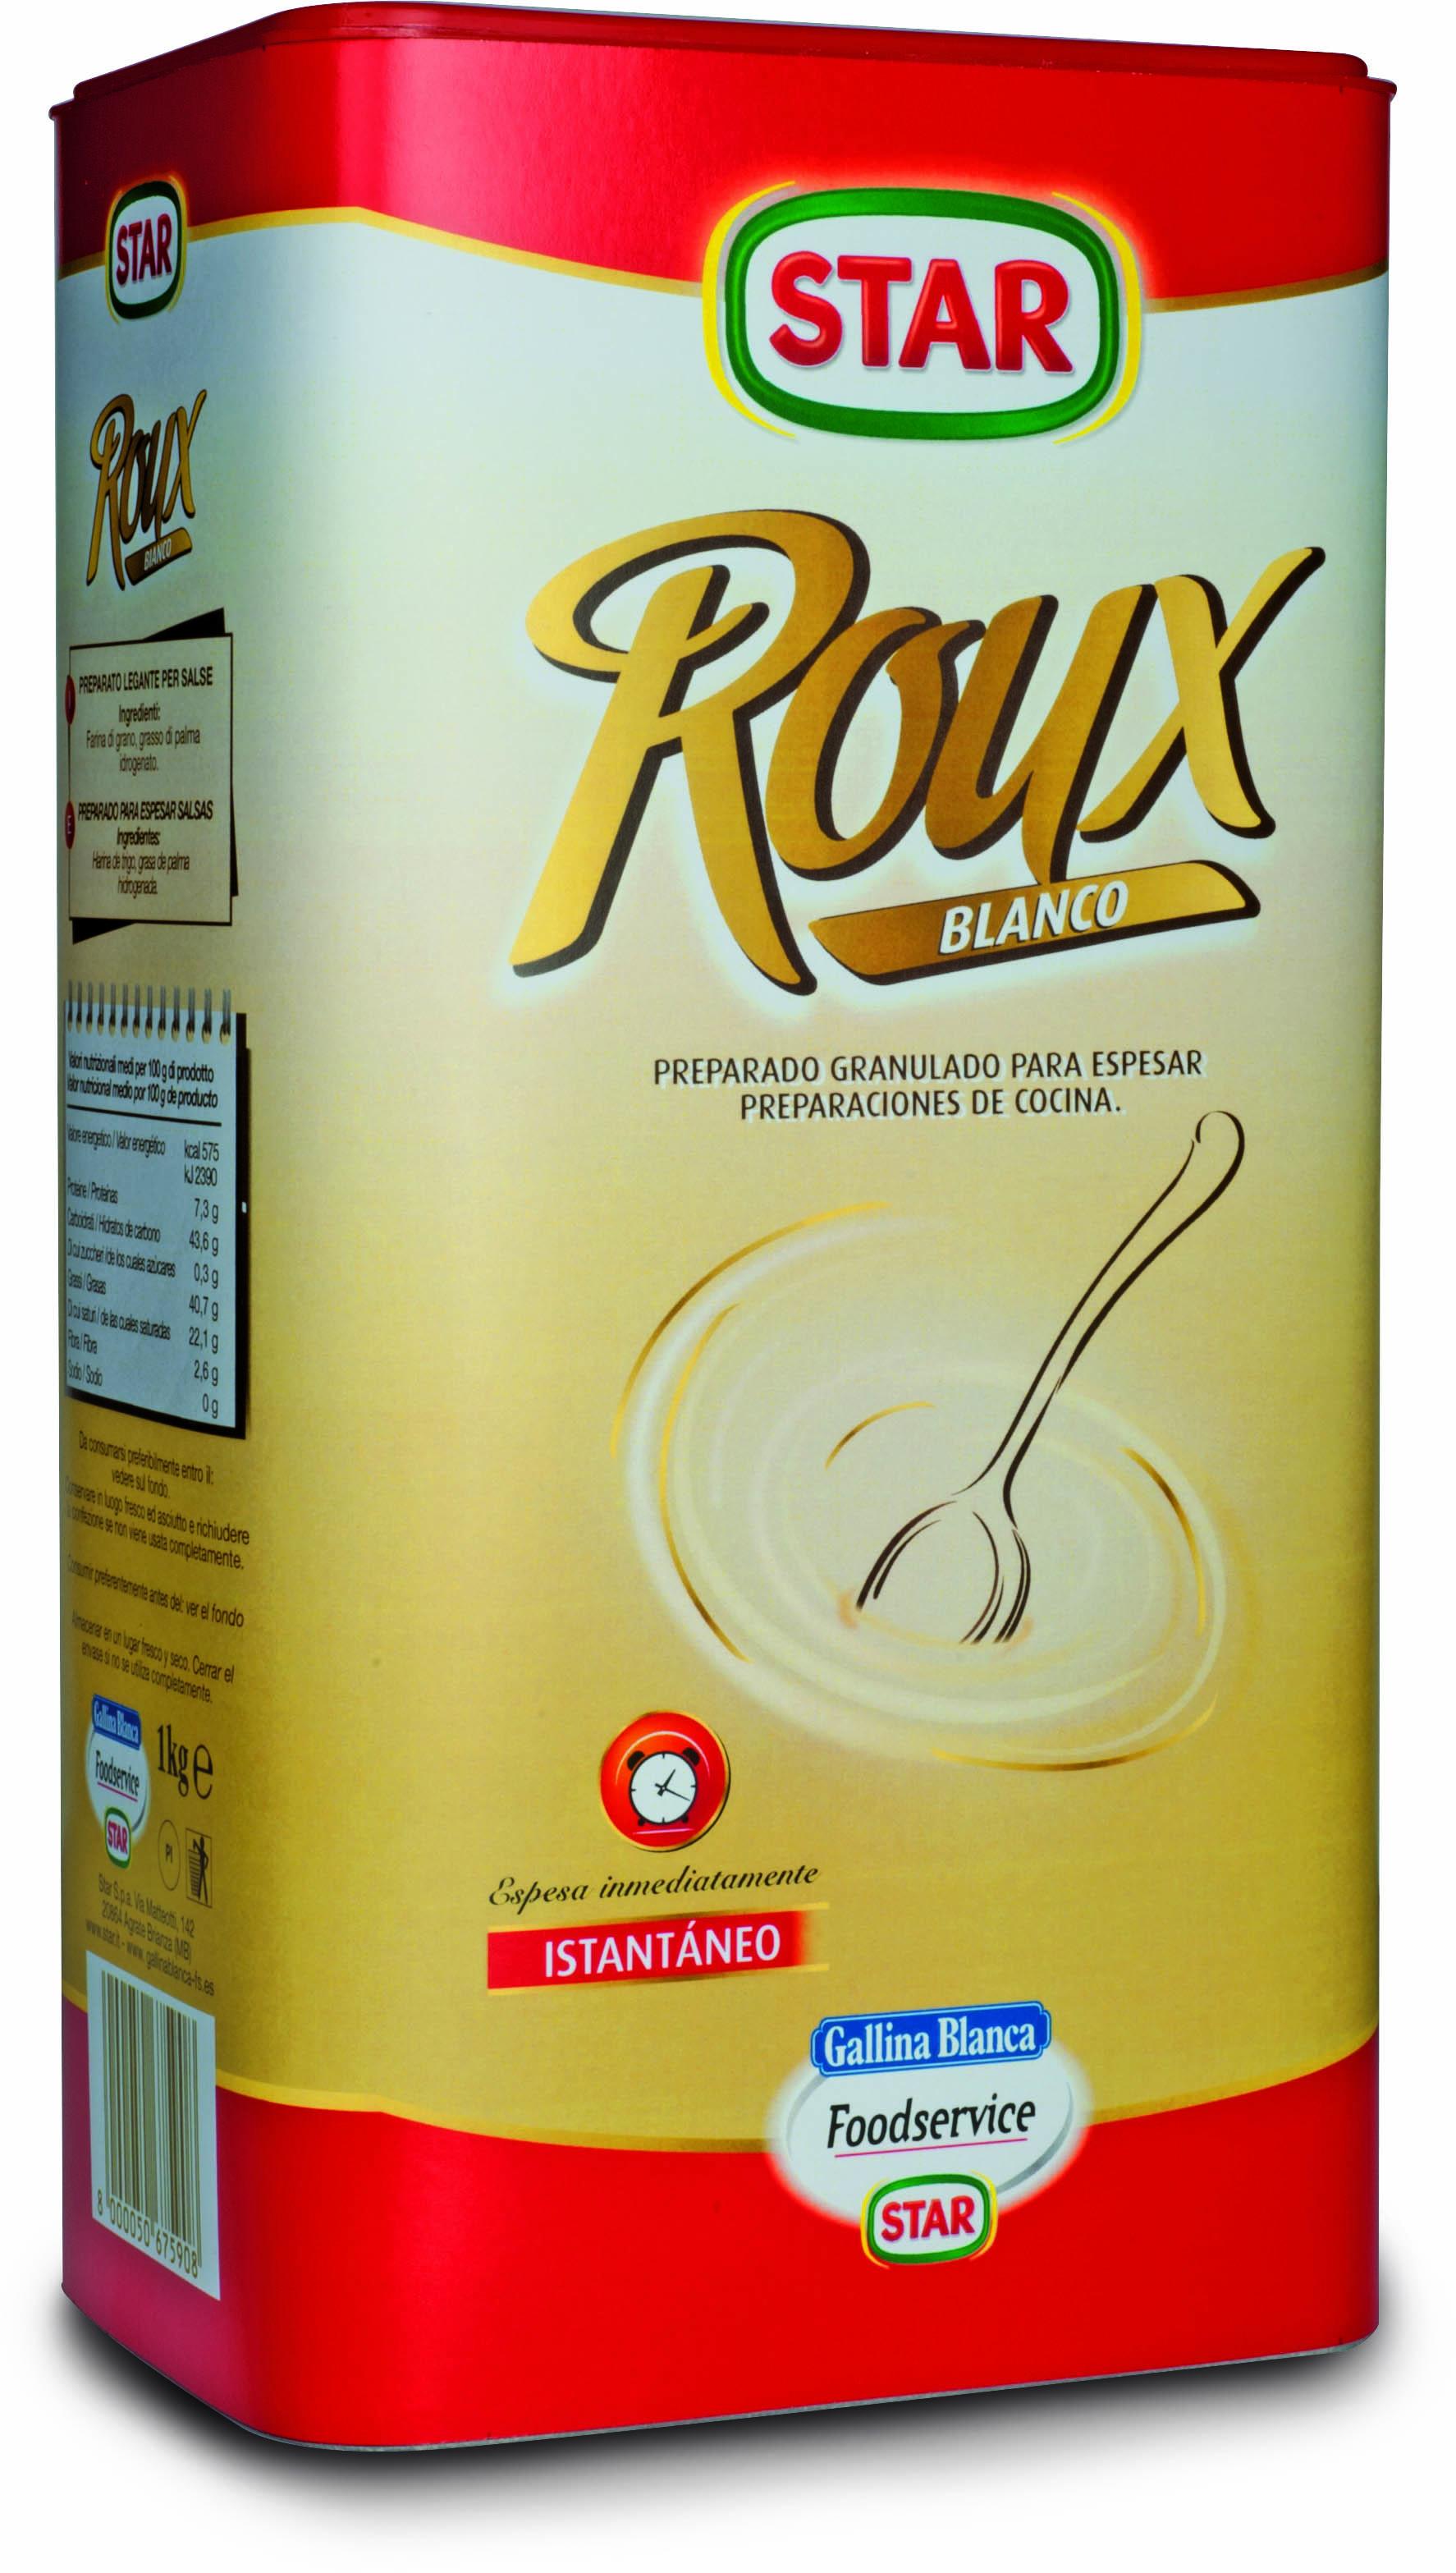 Roux Blanco, espesante, 1kg